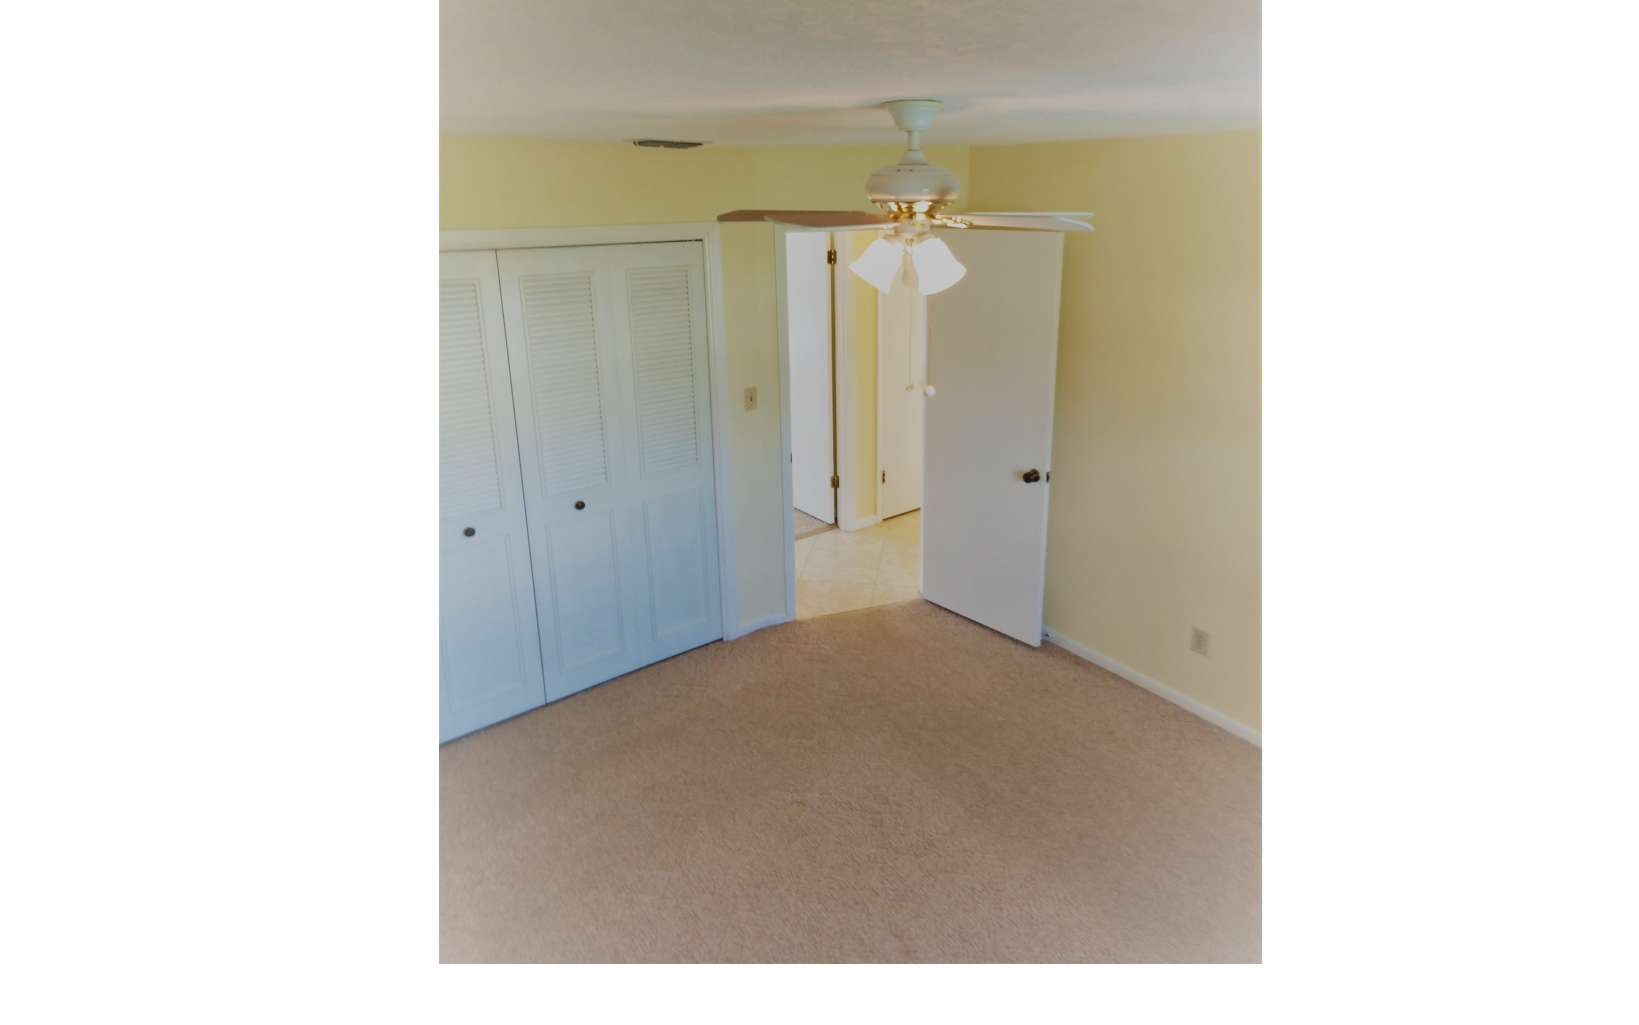 103 Edgewater Dr S, Lake Placid, FL 33852